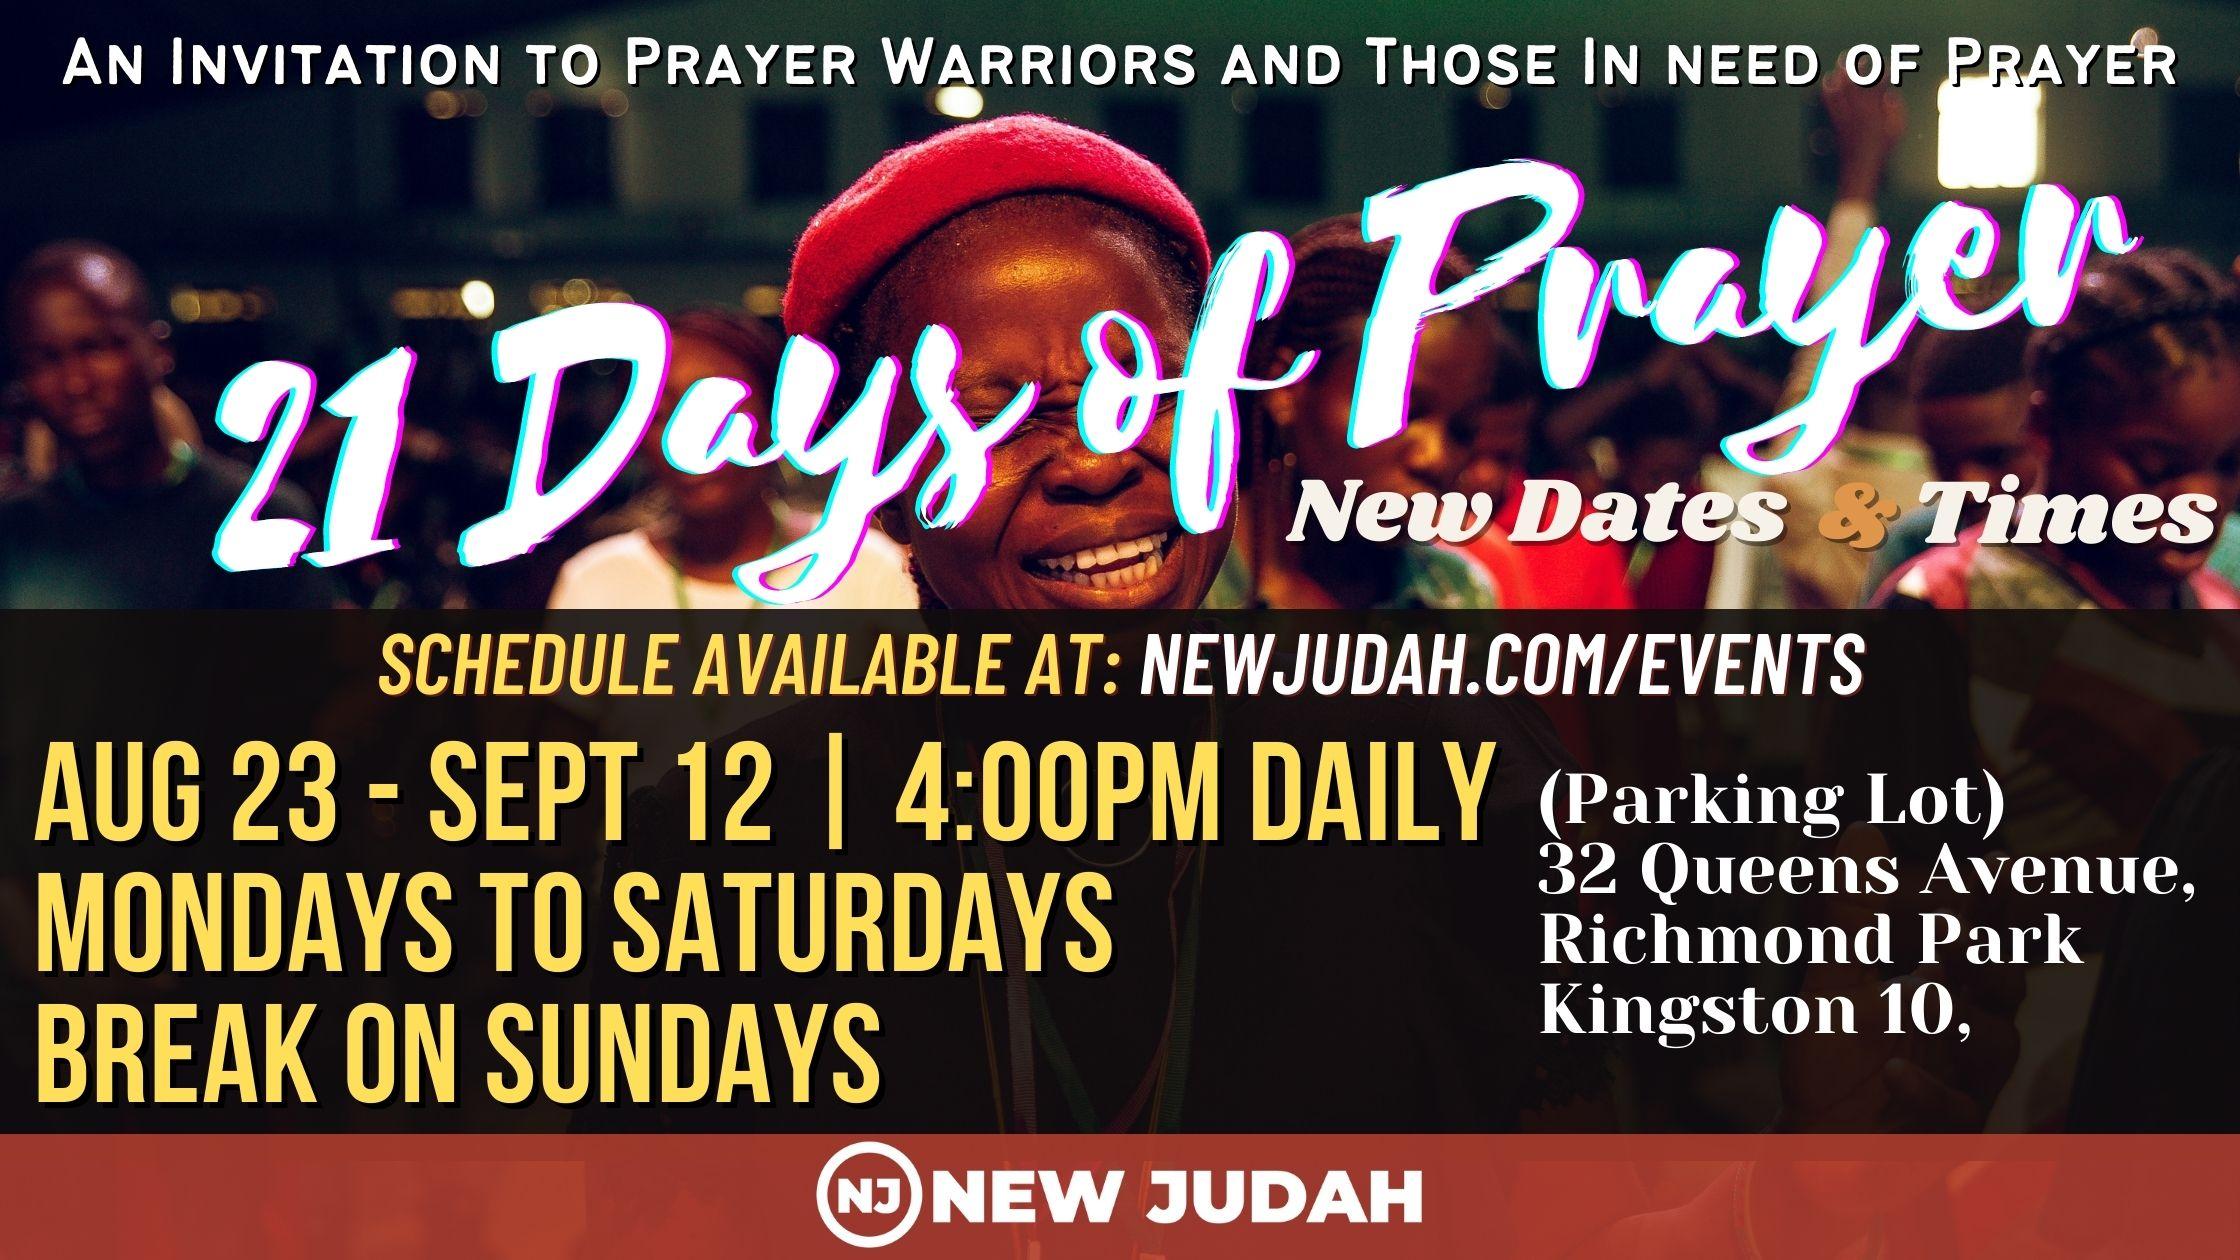 21 Days of Prayer Conference